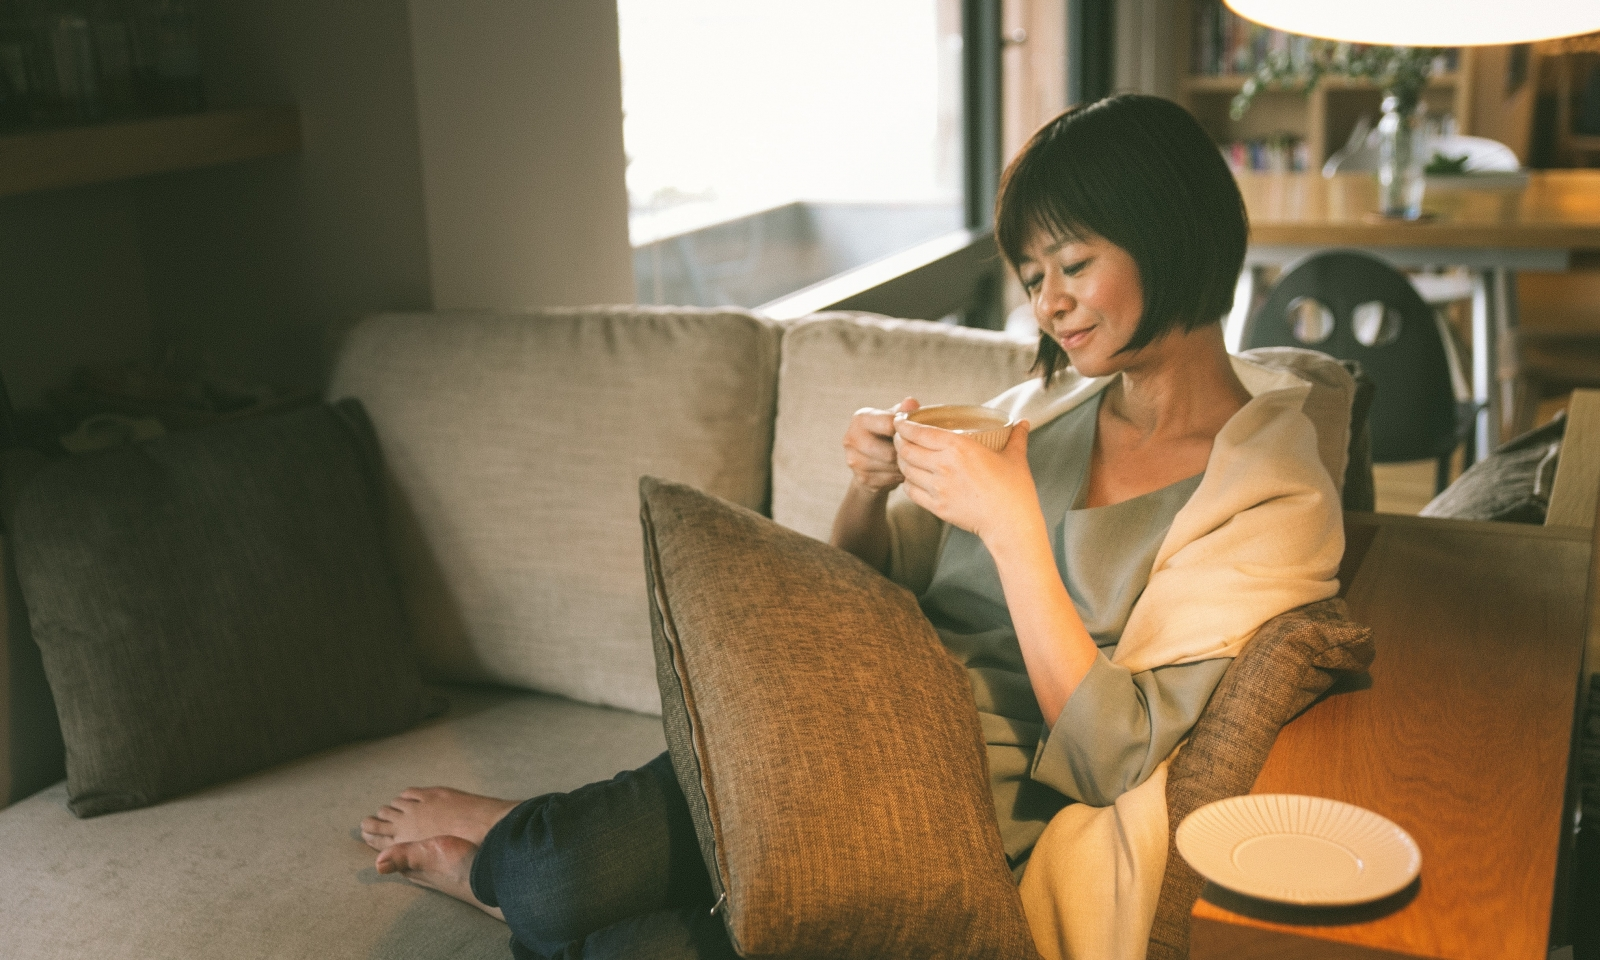 7 a.m. to 9 a.m. 淡中有層次的愛情長跑:葉怡蘭的三種早餐茶